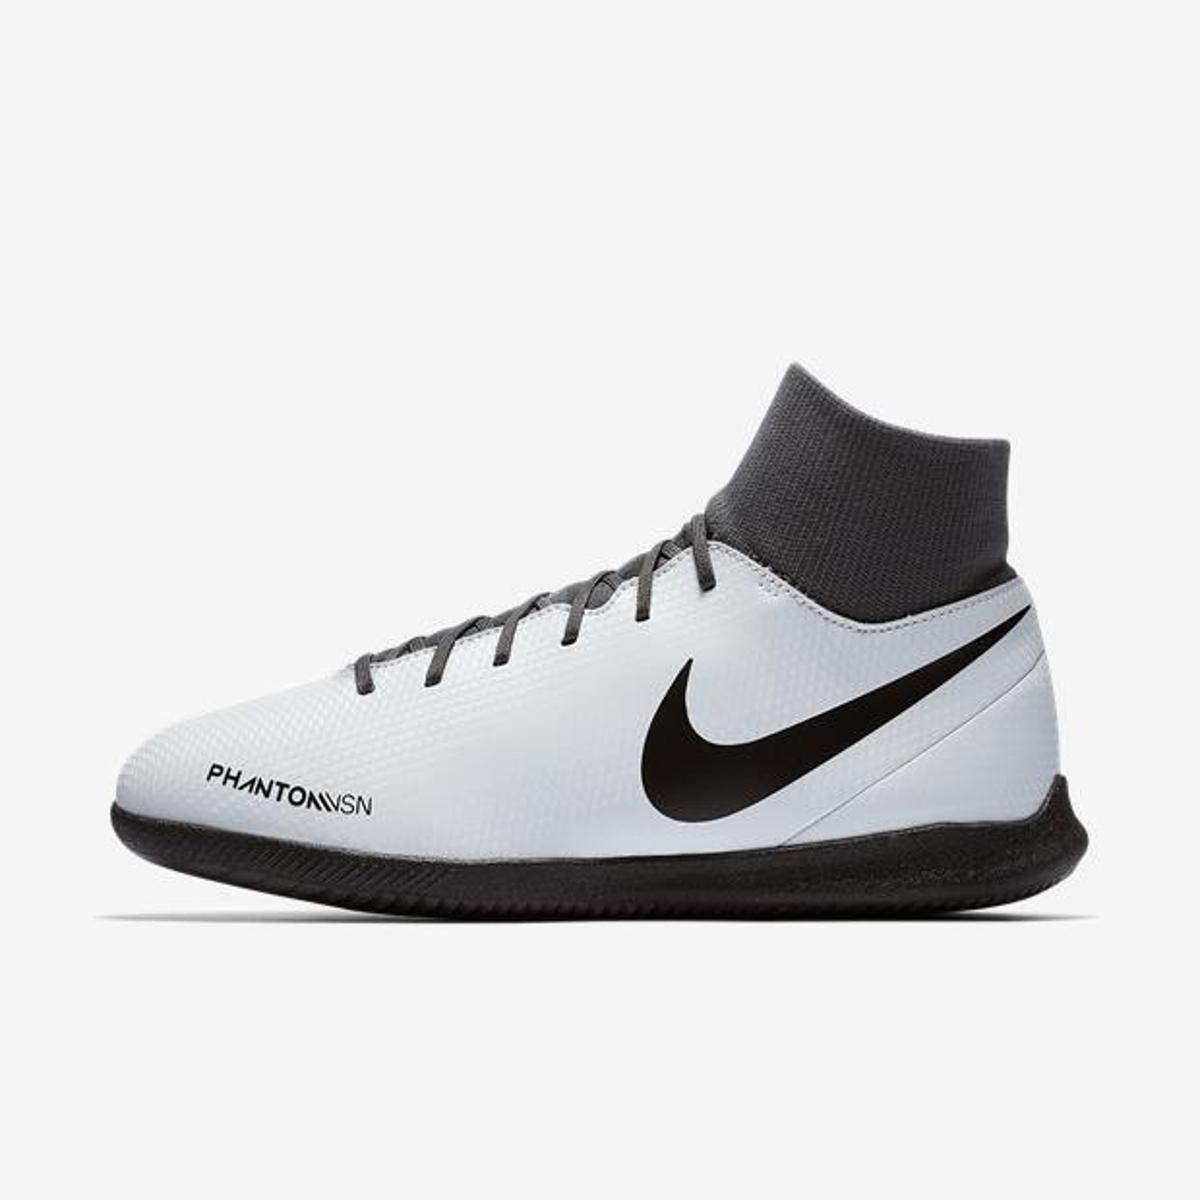 a7c39803b8 Chuteira Futsal Nike Phantom Vision Club DF IC - Cinza - Compre ...